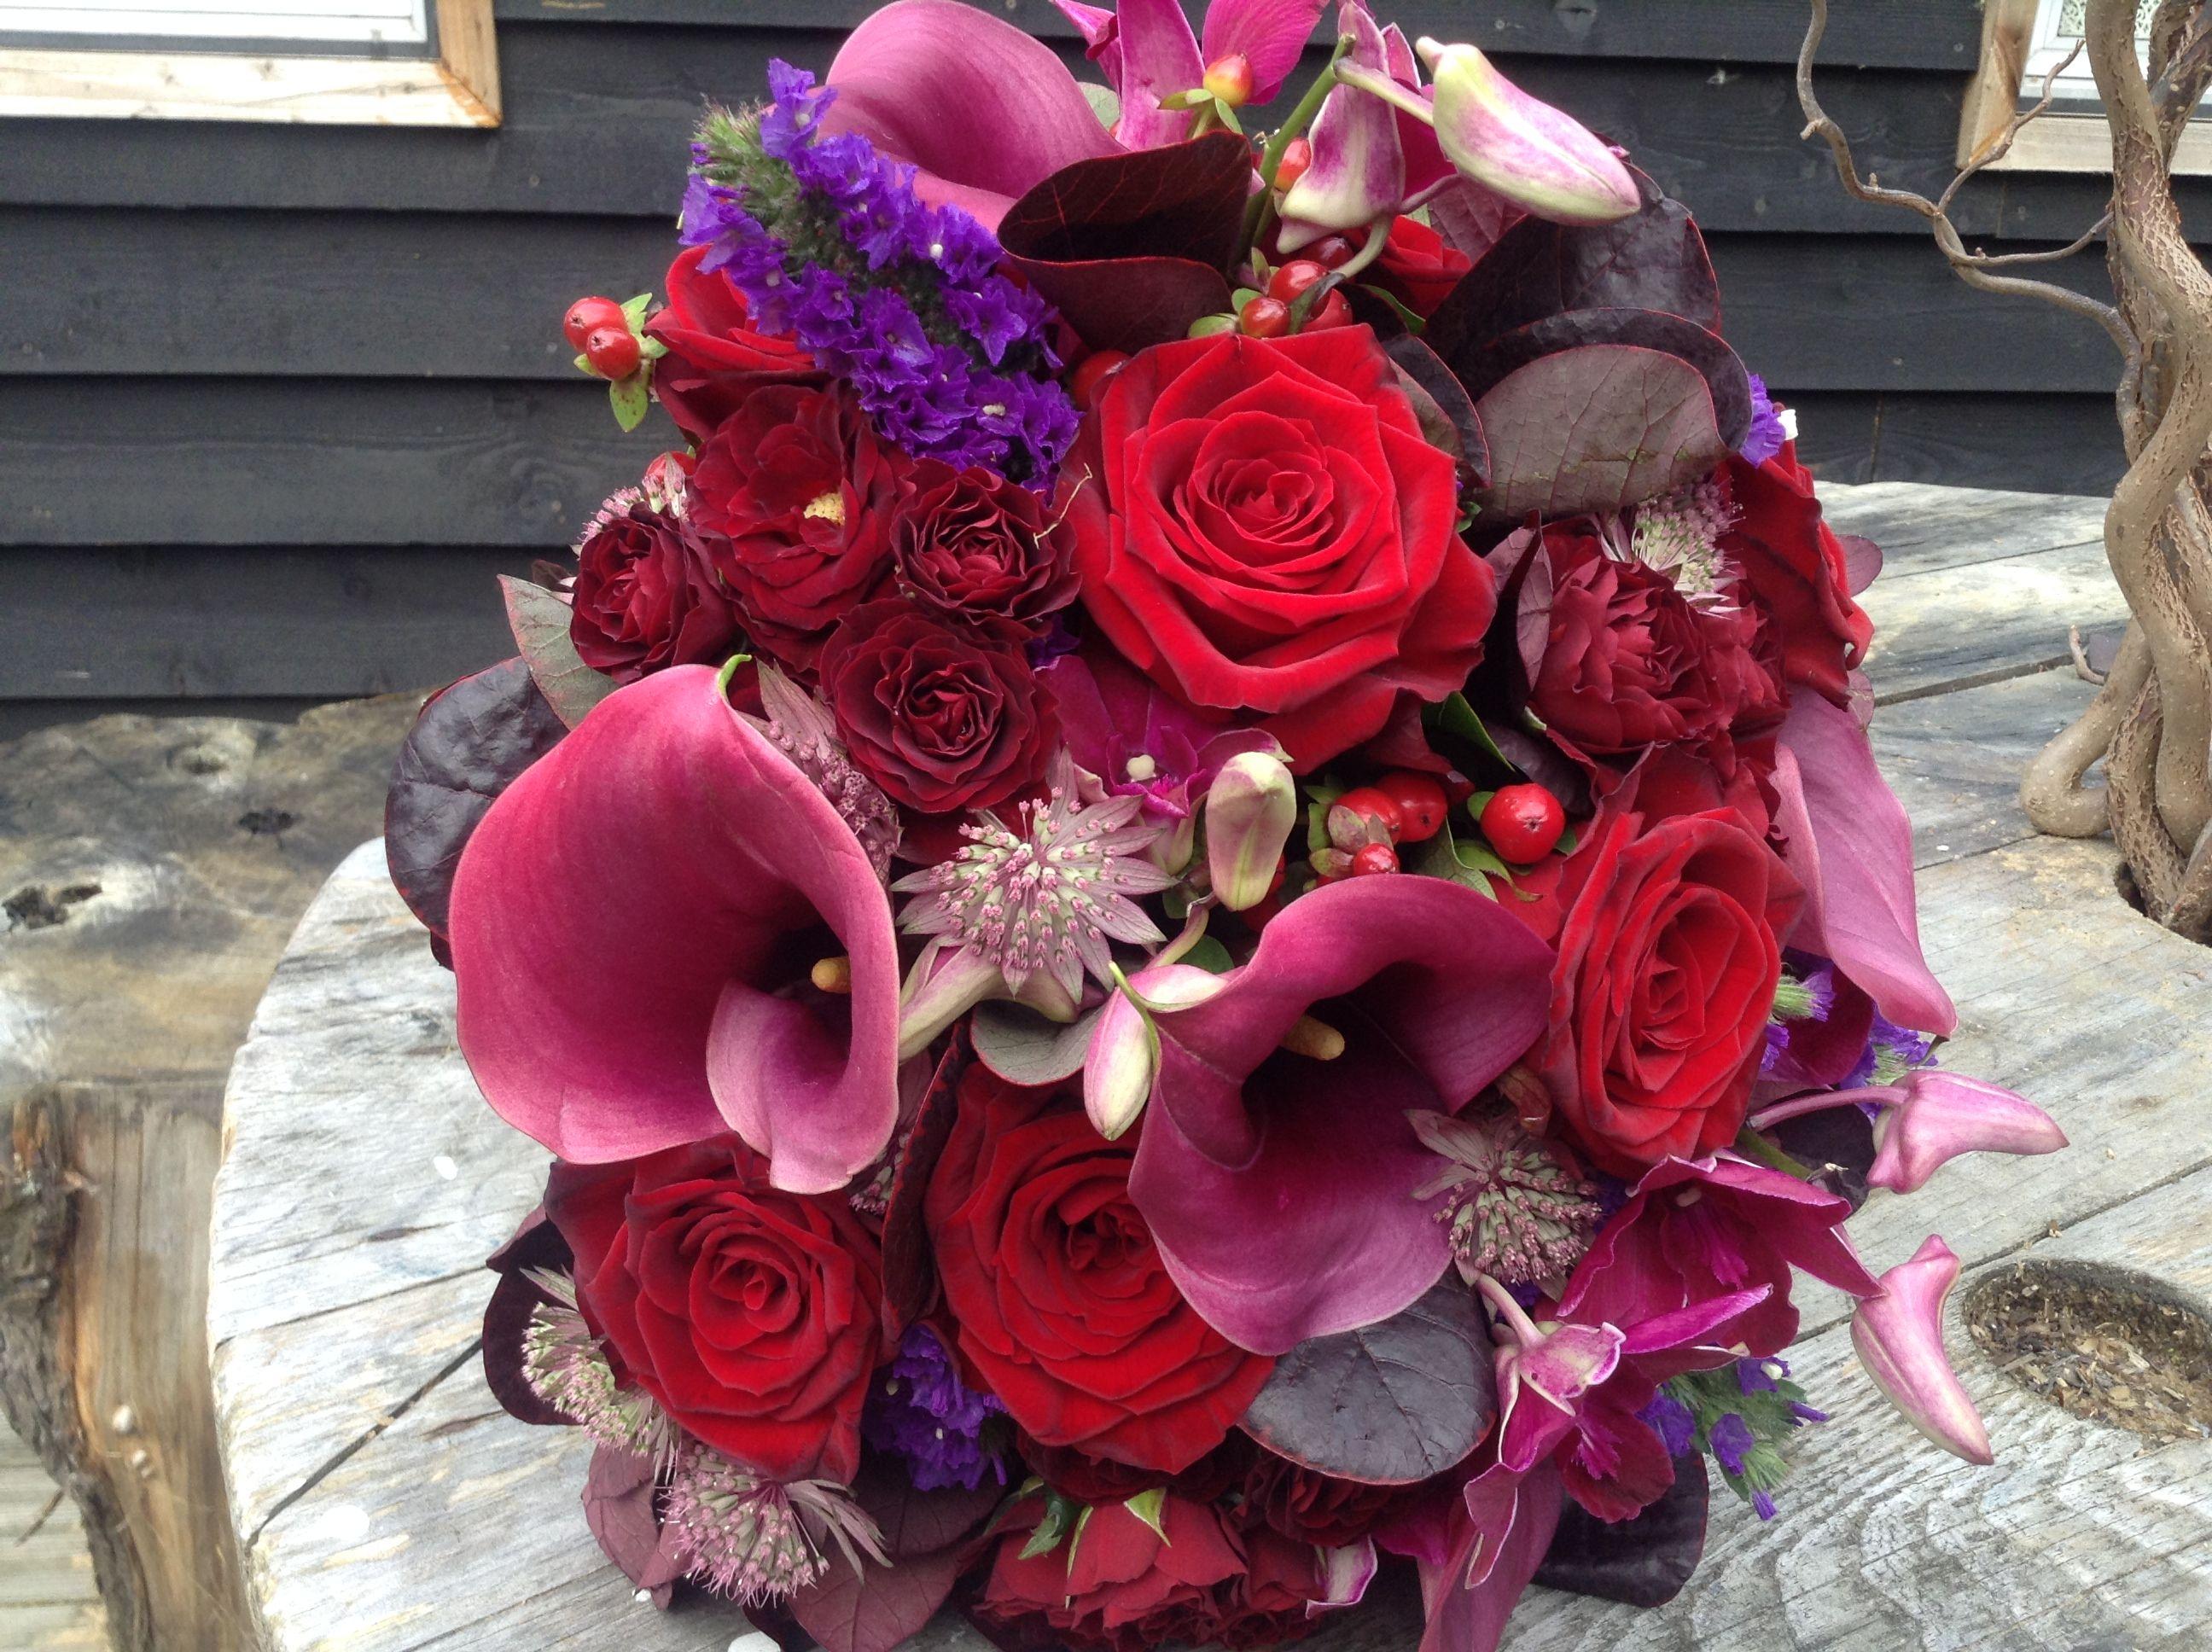 deep purple and red wedding flower bouquet. www